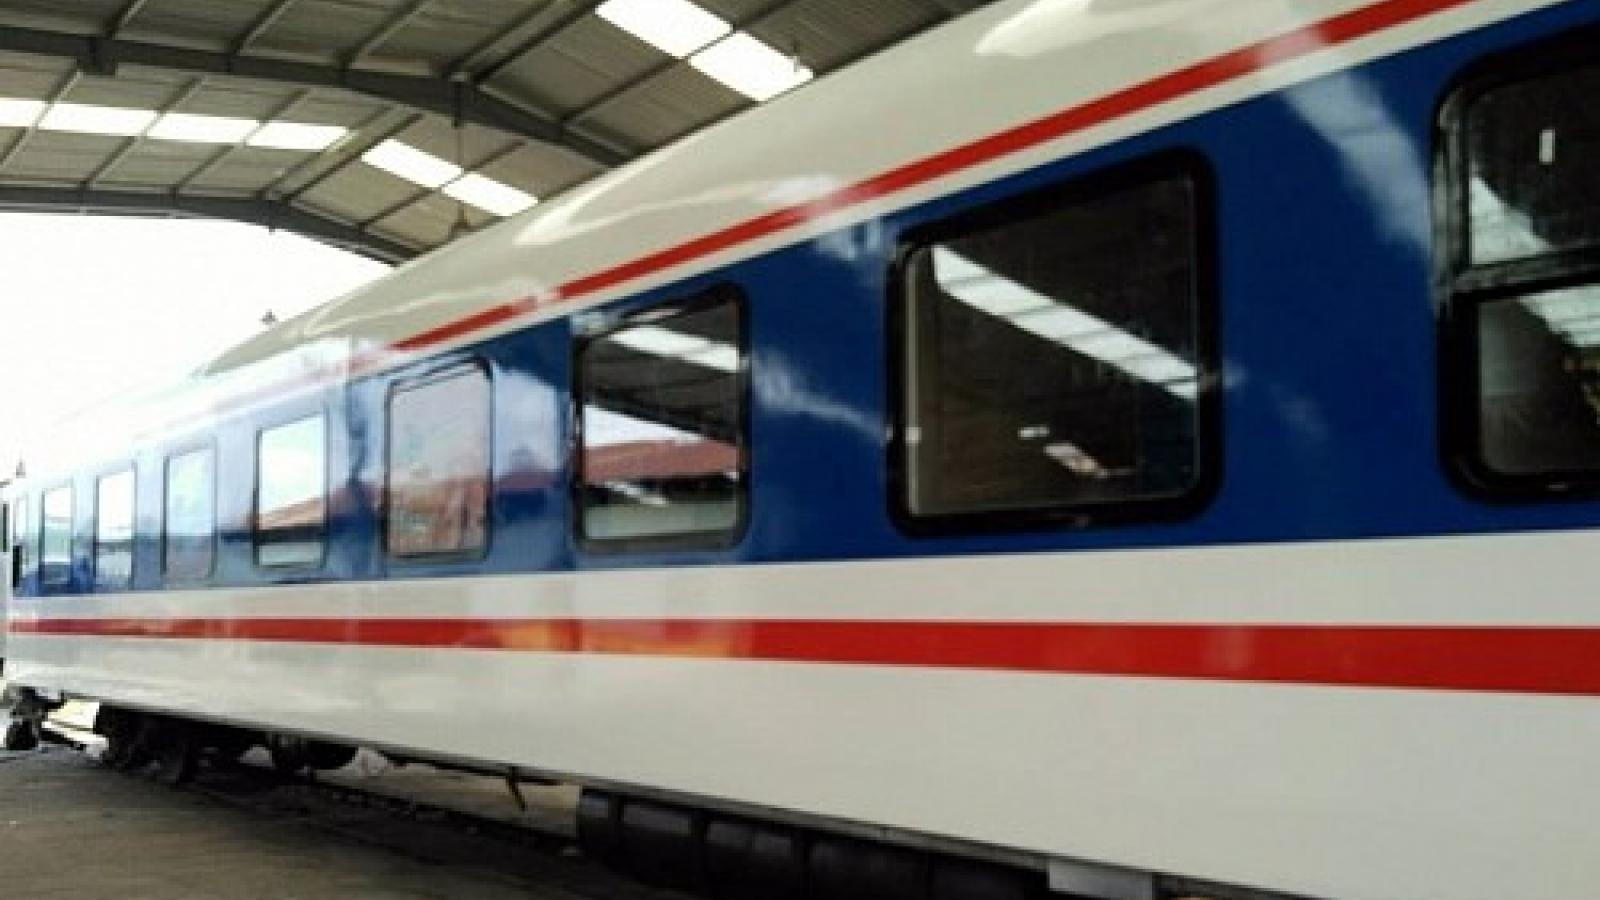 Saigon Railways to debut self-built train car next month